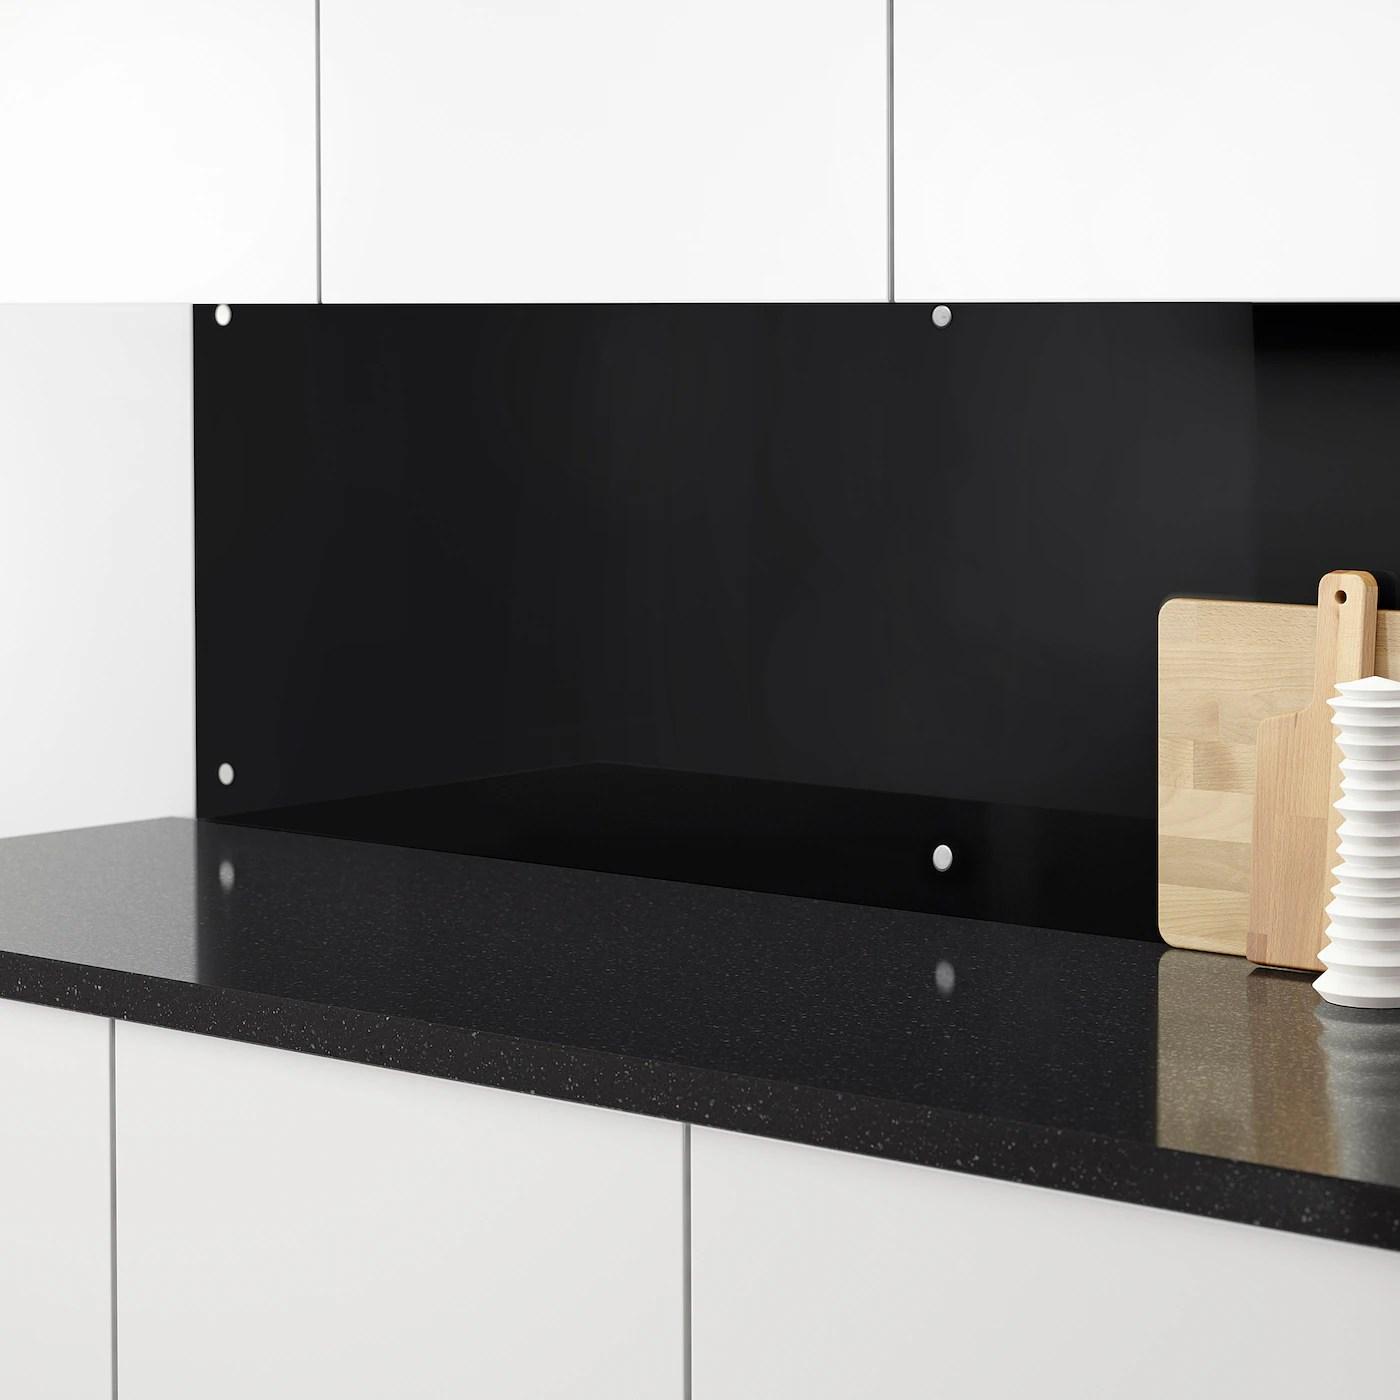 Ishult Revetement Mural Sur Mesure Noir Verre Ikea